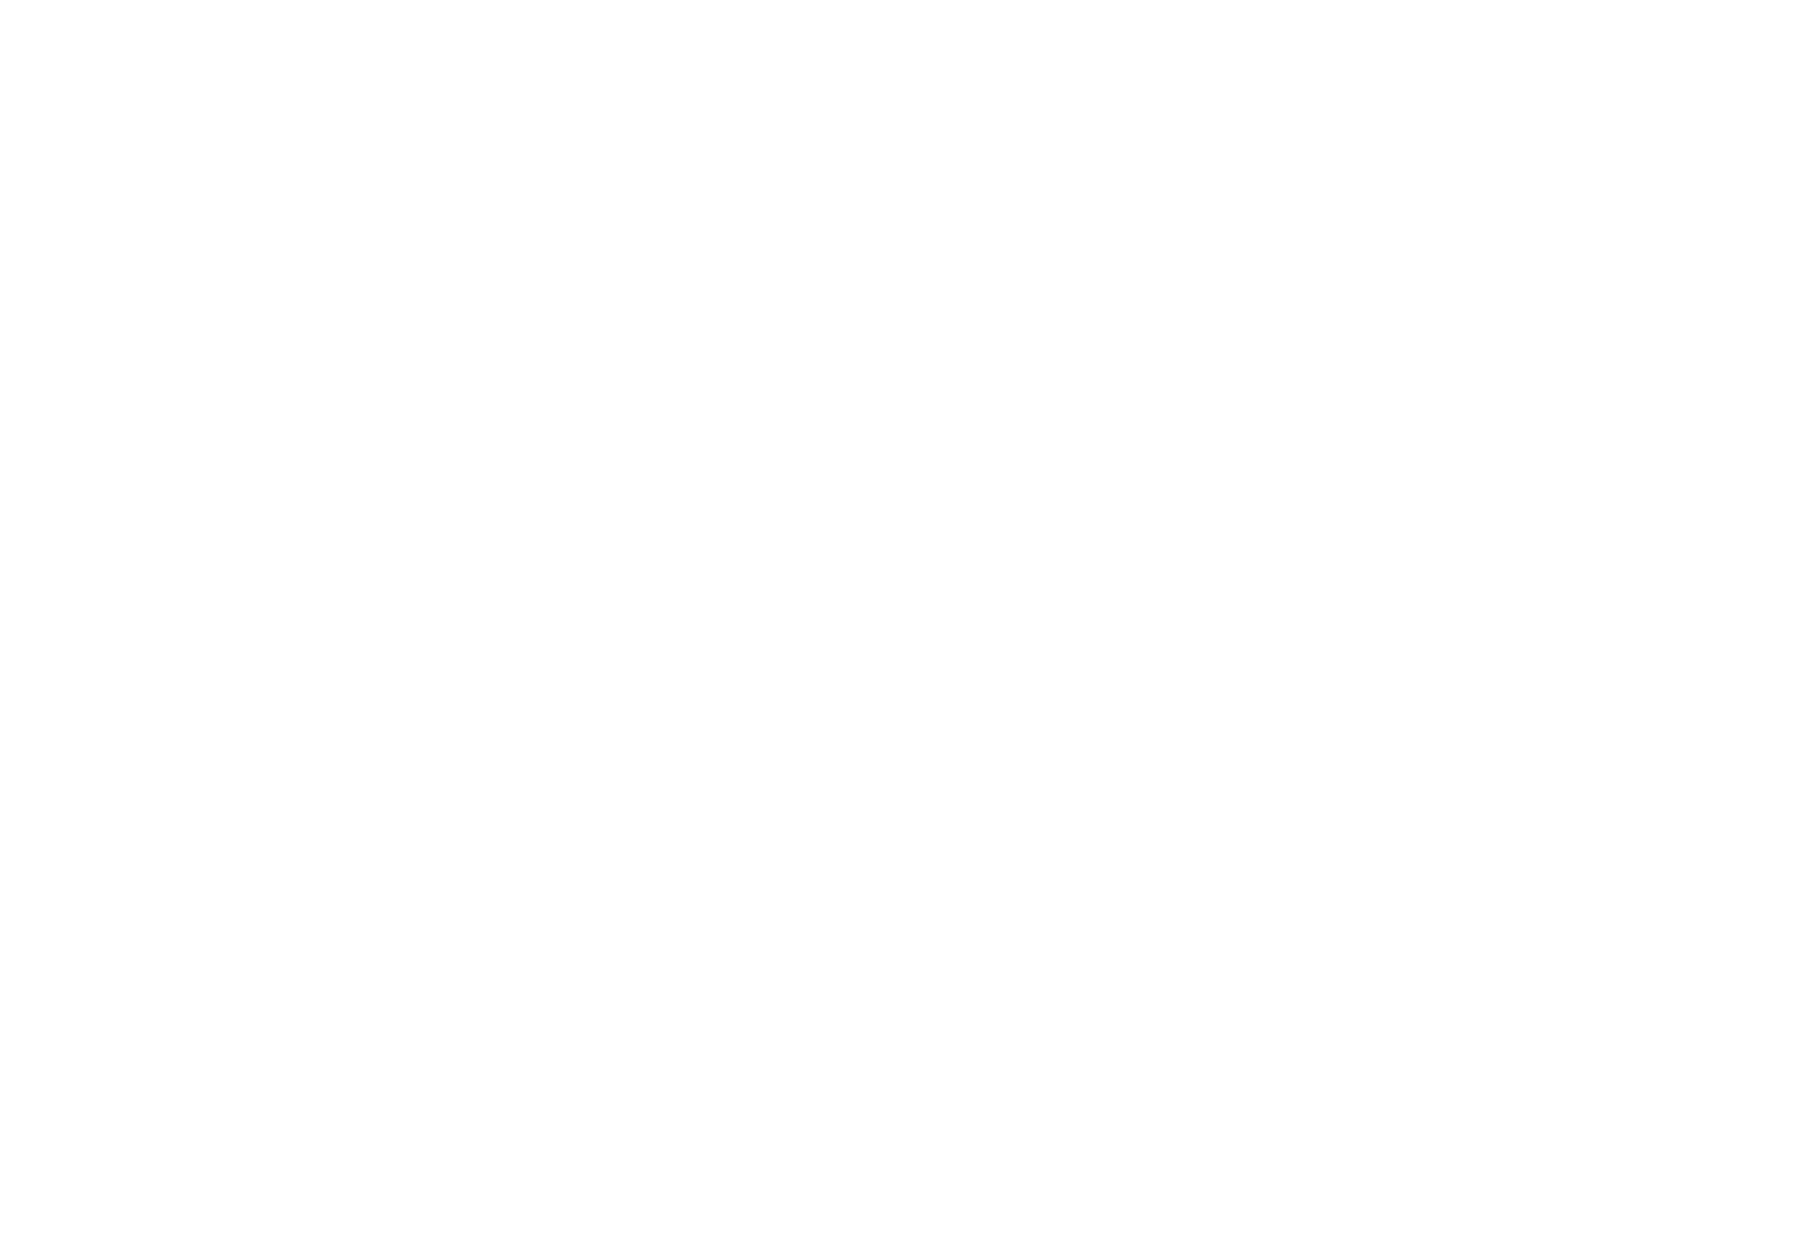 Sync Shop